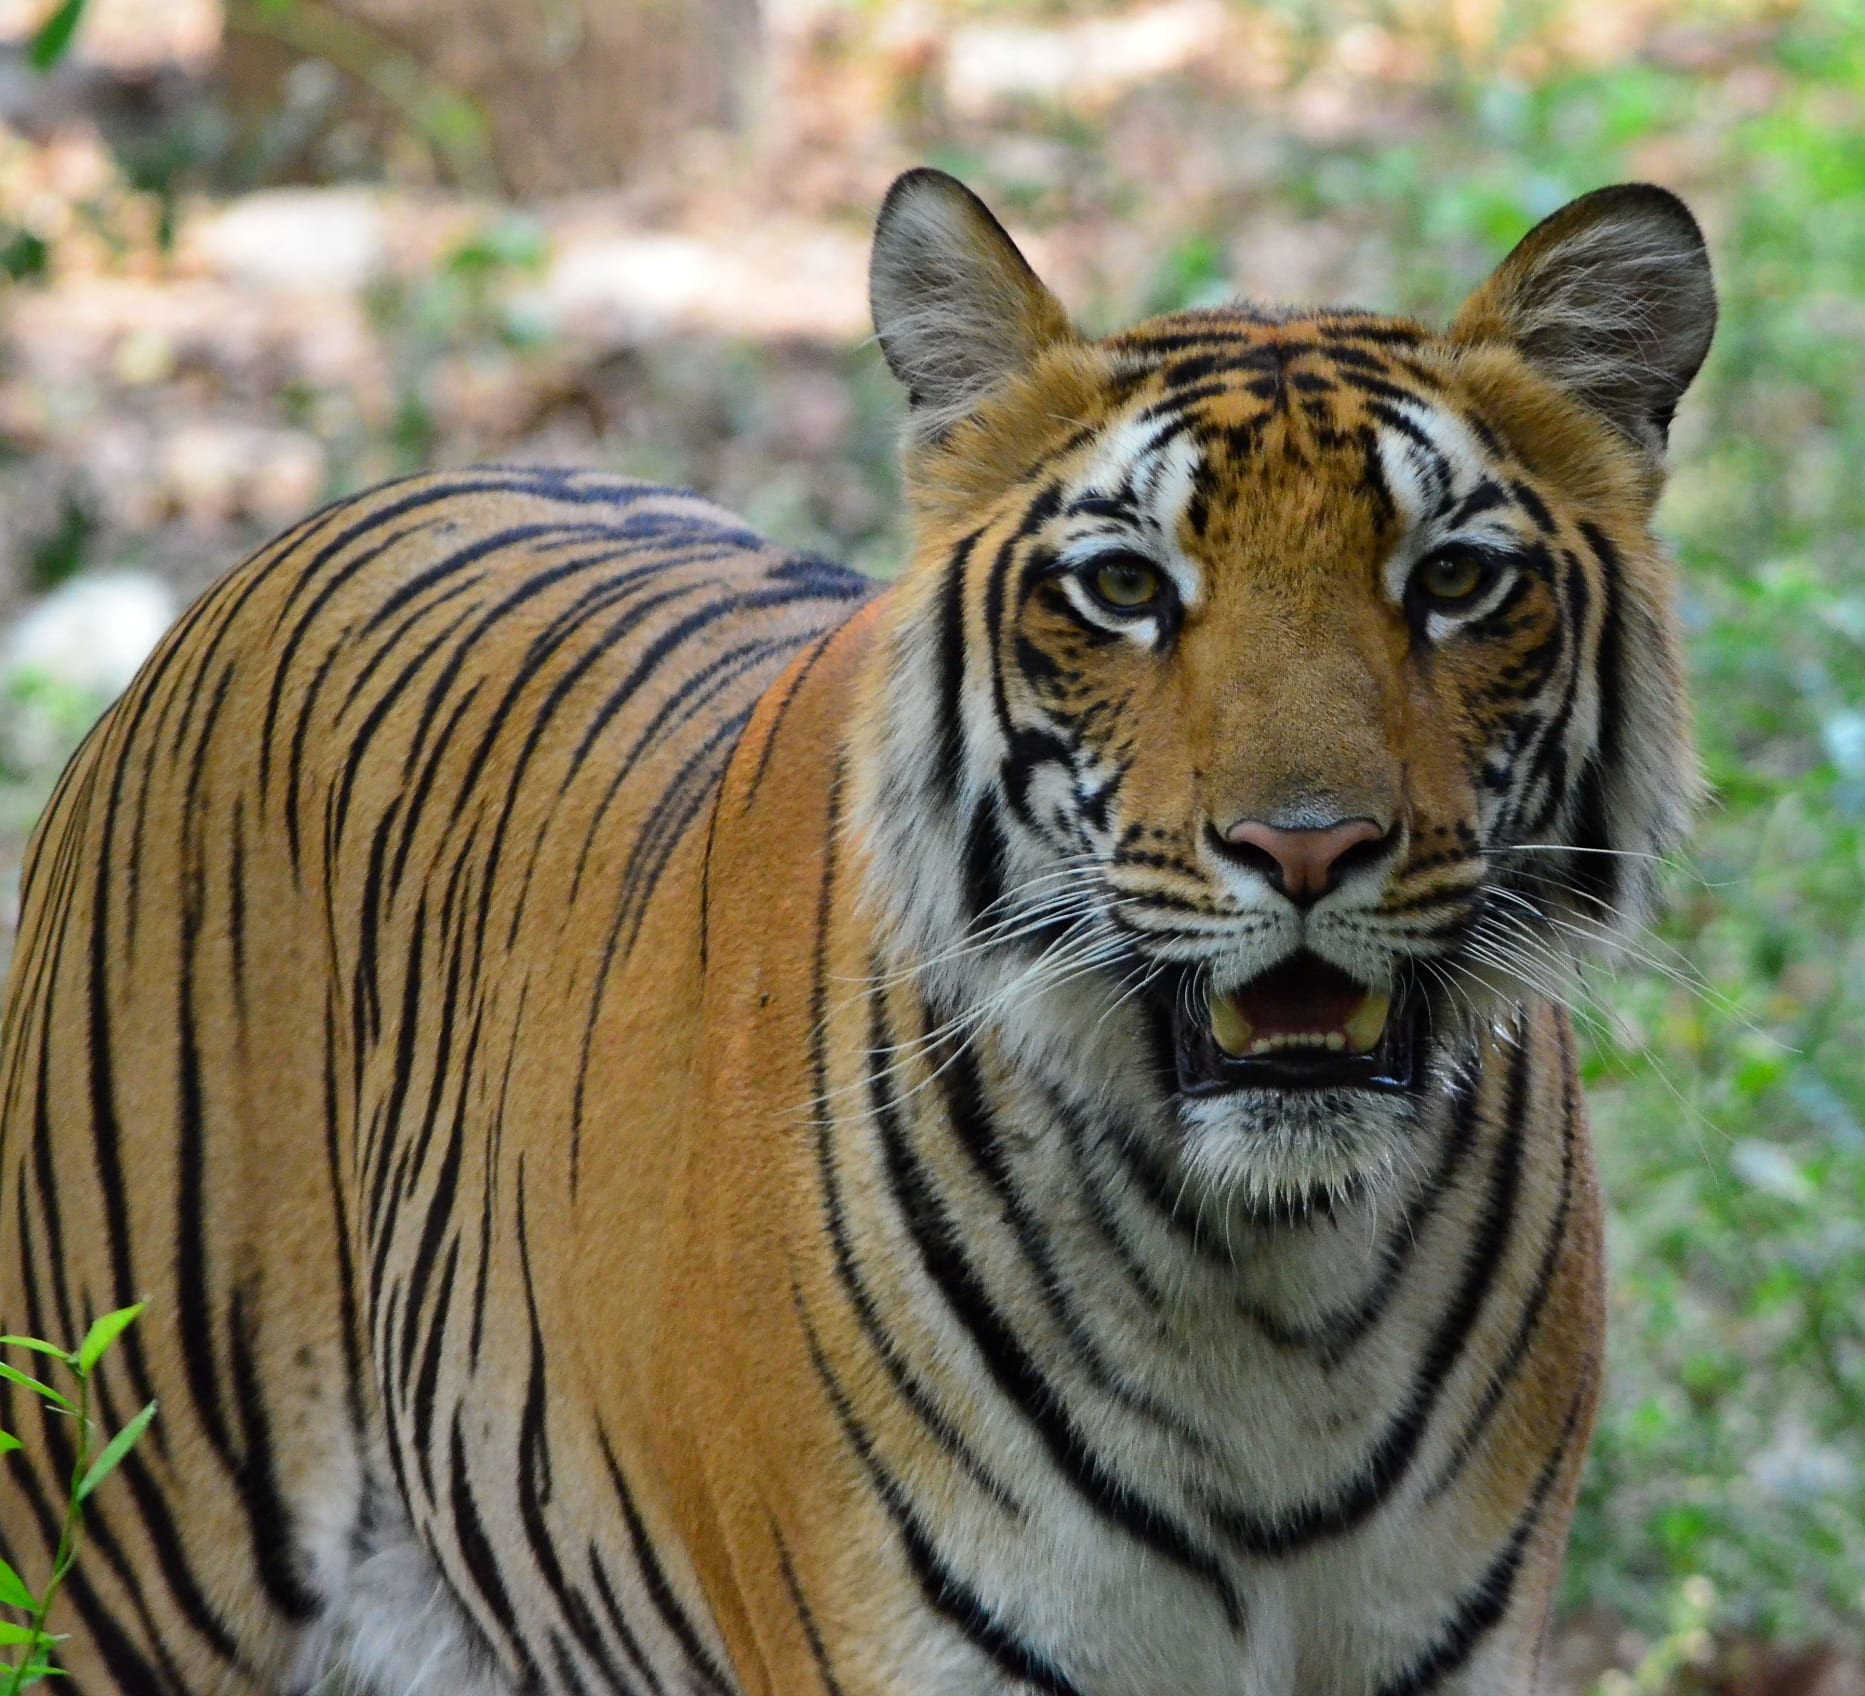 Chhattisgarh next tiger reserve – Bhoramdeo or Guru Ghasidas?